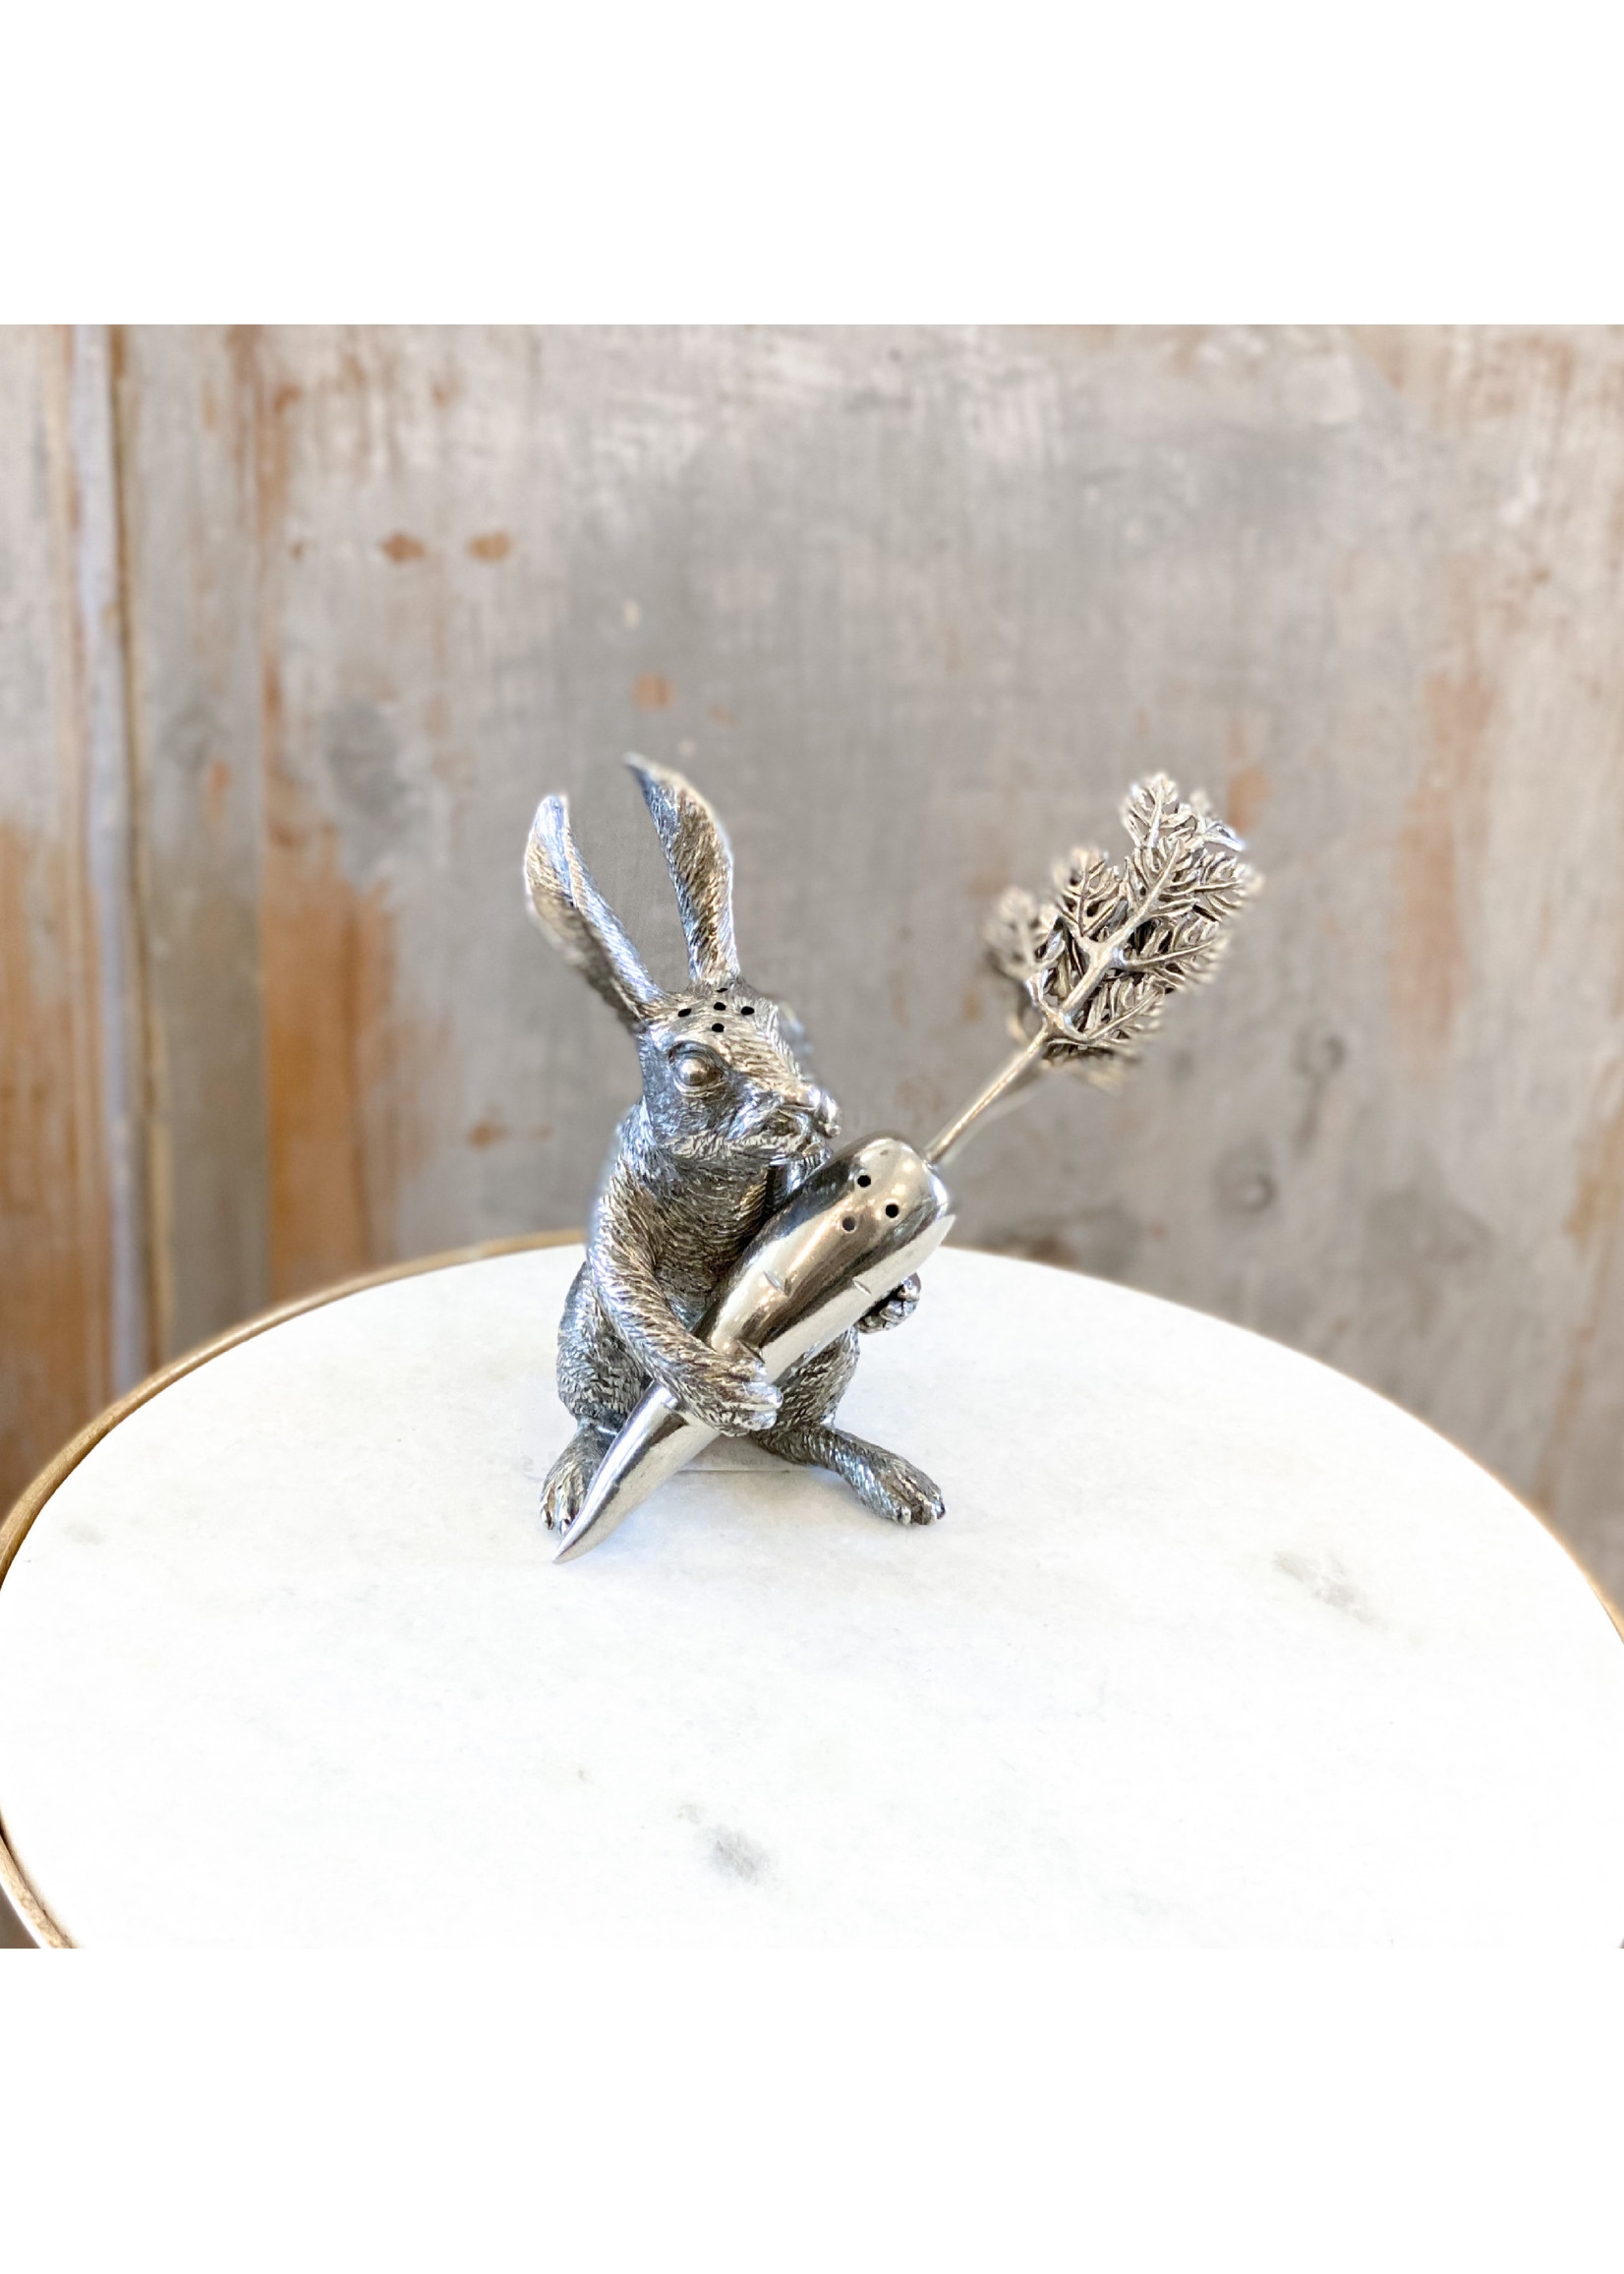 Salt & Pepper Set - Rabbit & Carrot